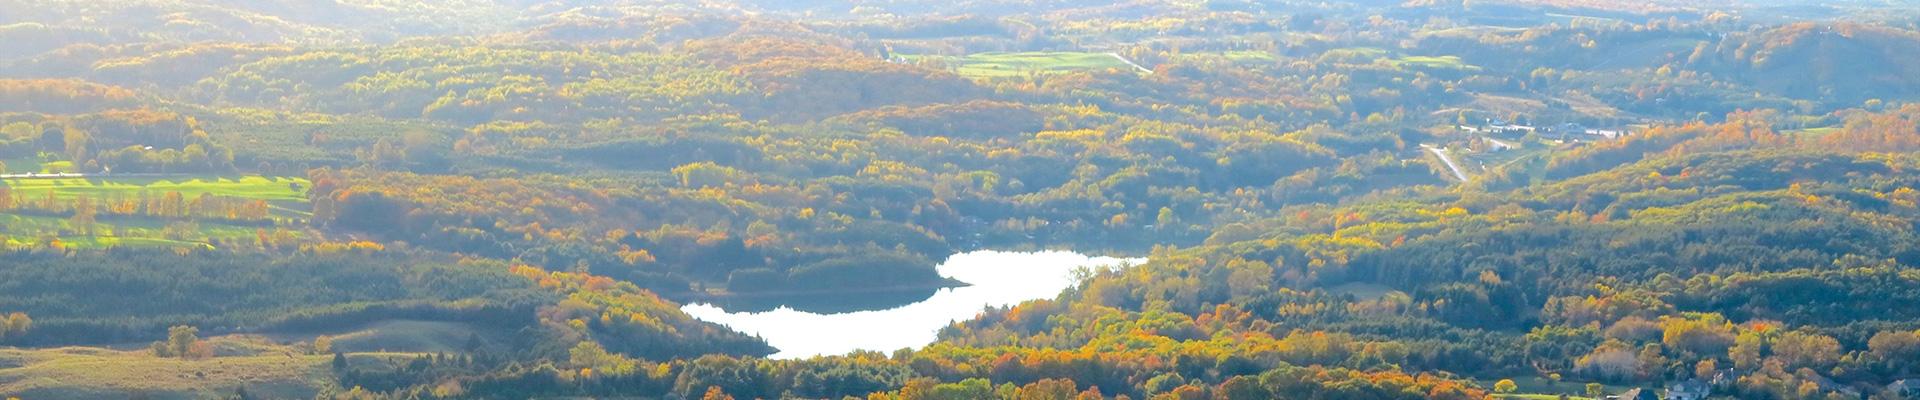 Photo-Greenbelt-Aerial_Credit-billlishman-02.jpg